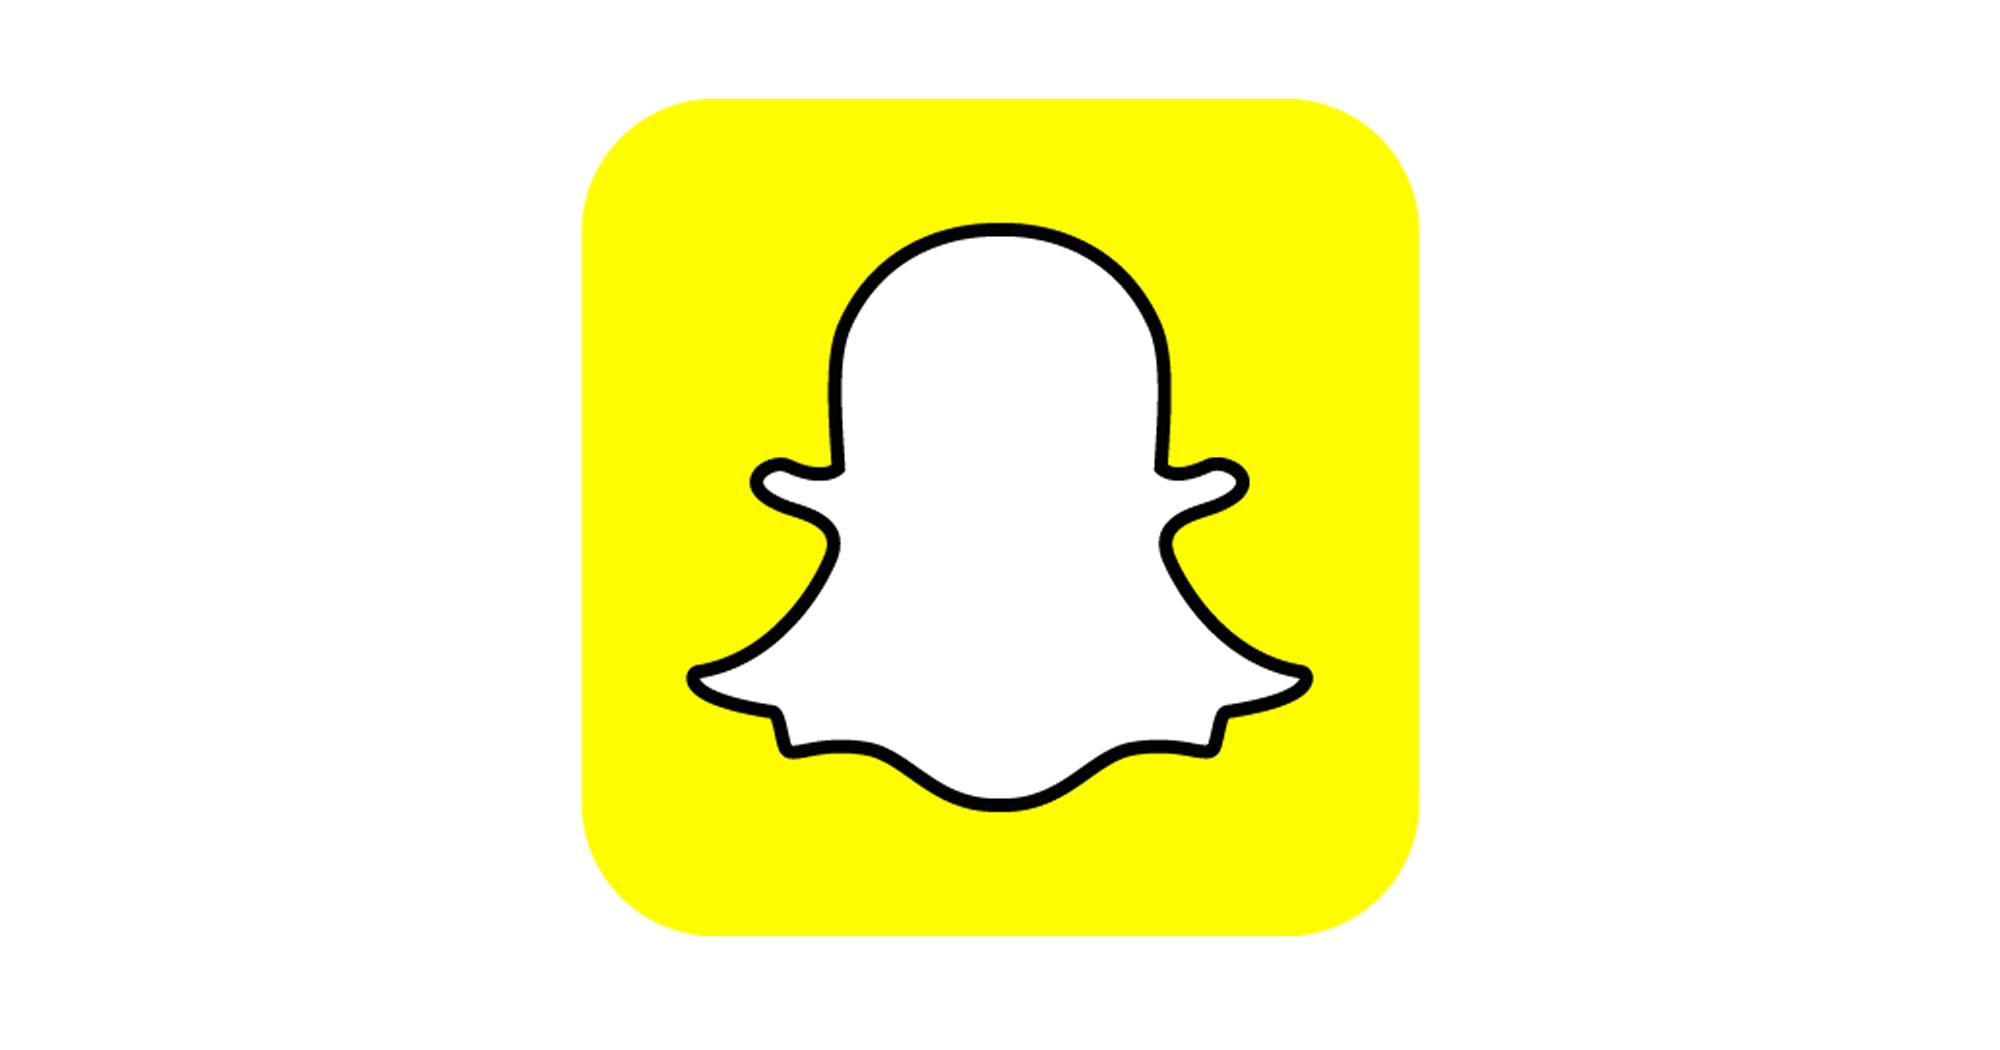 3 Seconds Snapchat Horror Short Film